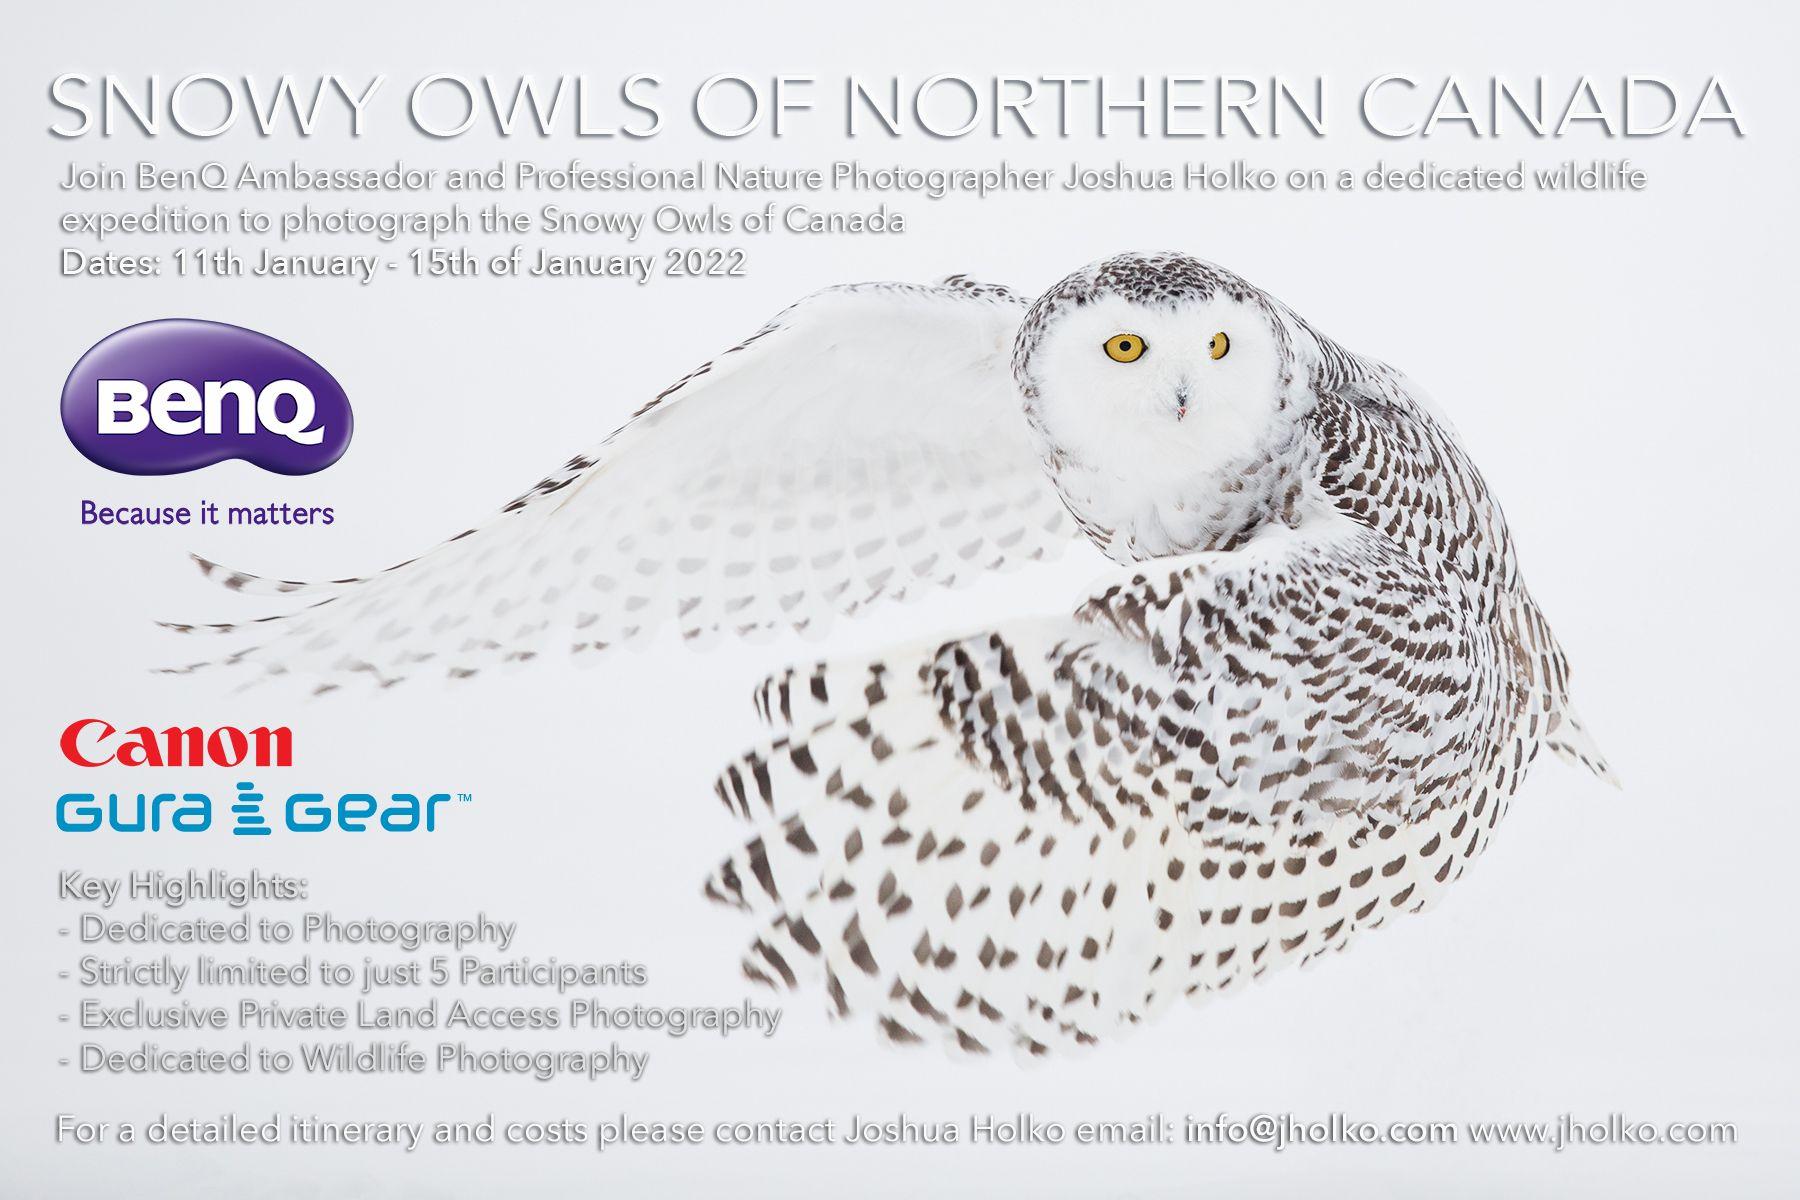 Snowy Owls of Northern Canada with Joshua Holko